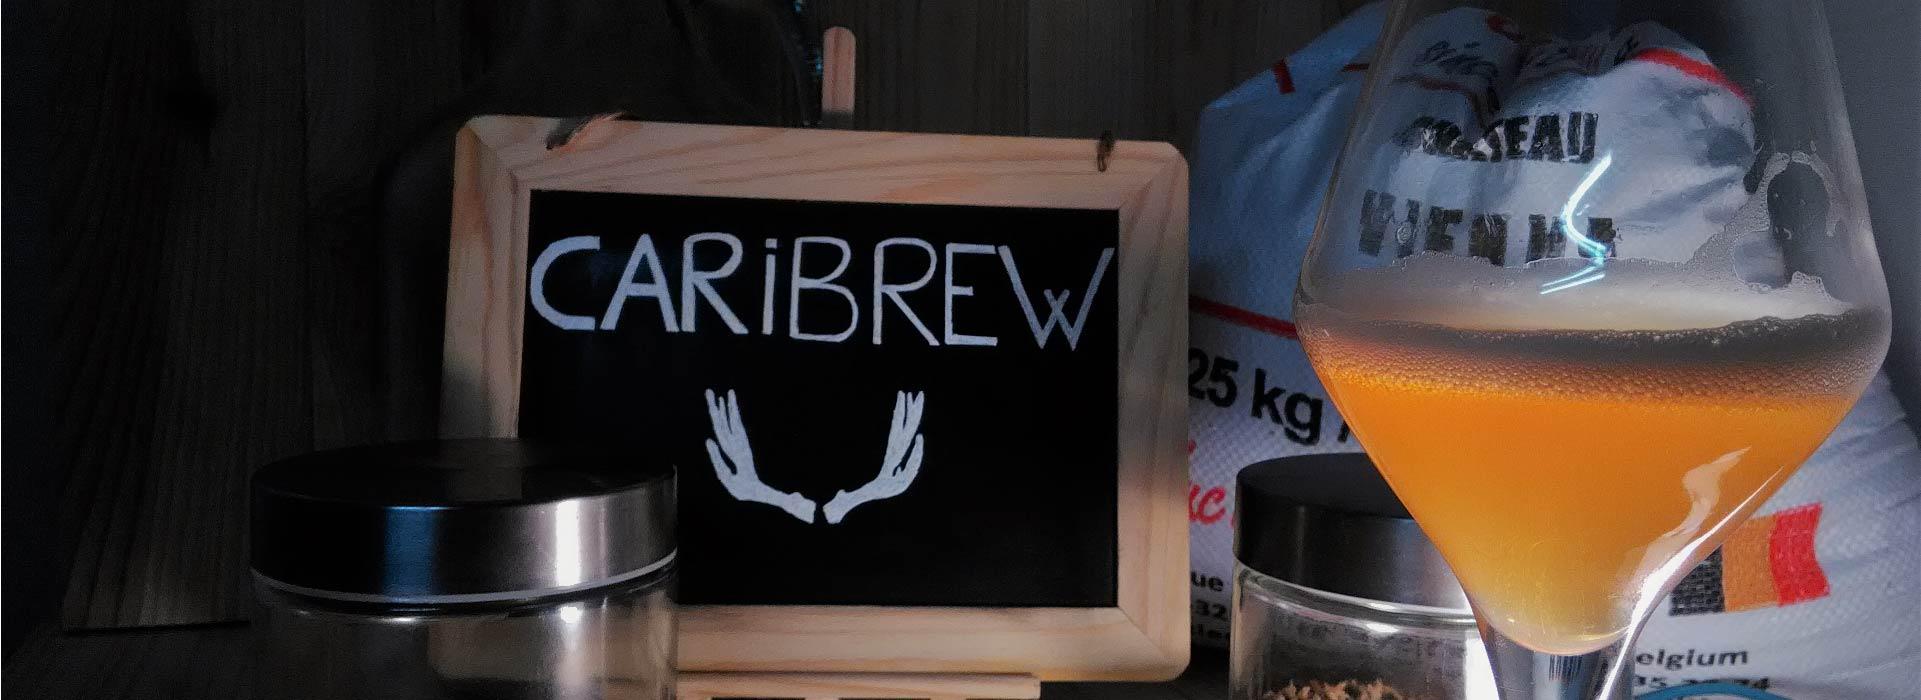 Microbrasserie-Artisanale-Bière-Lyon-Caribrew-Bières(3)